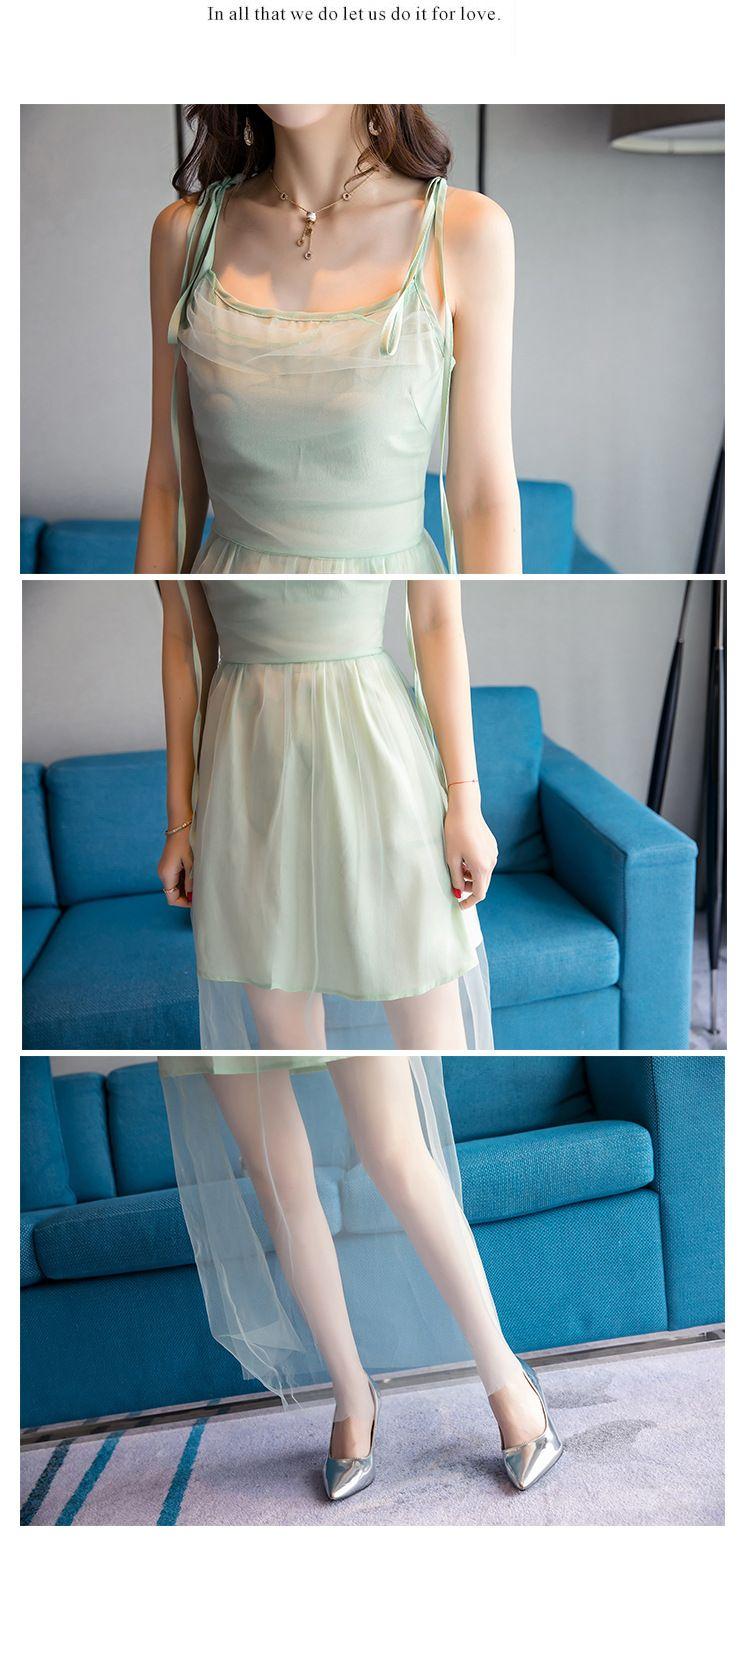 137202c094b New Summer Long Skirt Fairy Gauze Sling Beach Dress Sleeveless Bohemian  Casual Maxi Vacation By Sea A0100 Shop Sundresses White Dresses Party From  ...